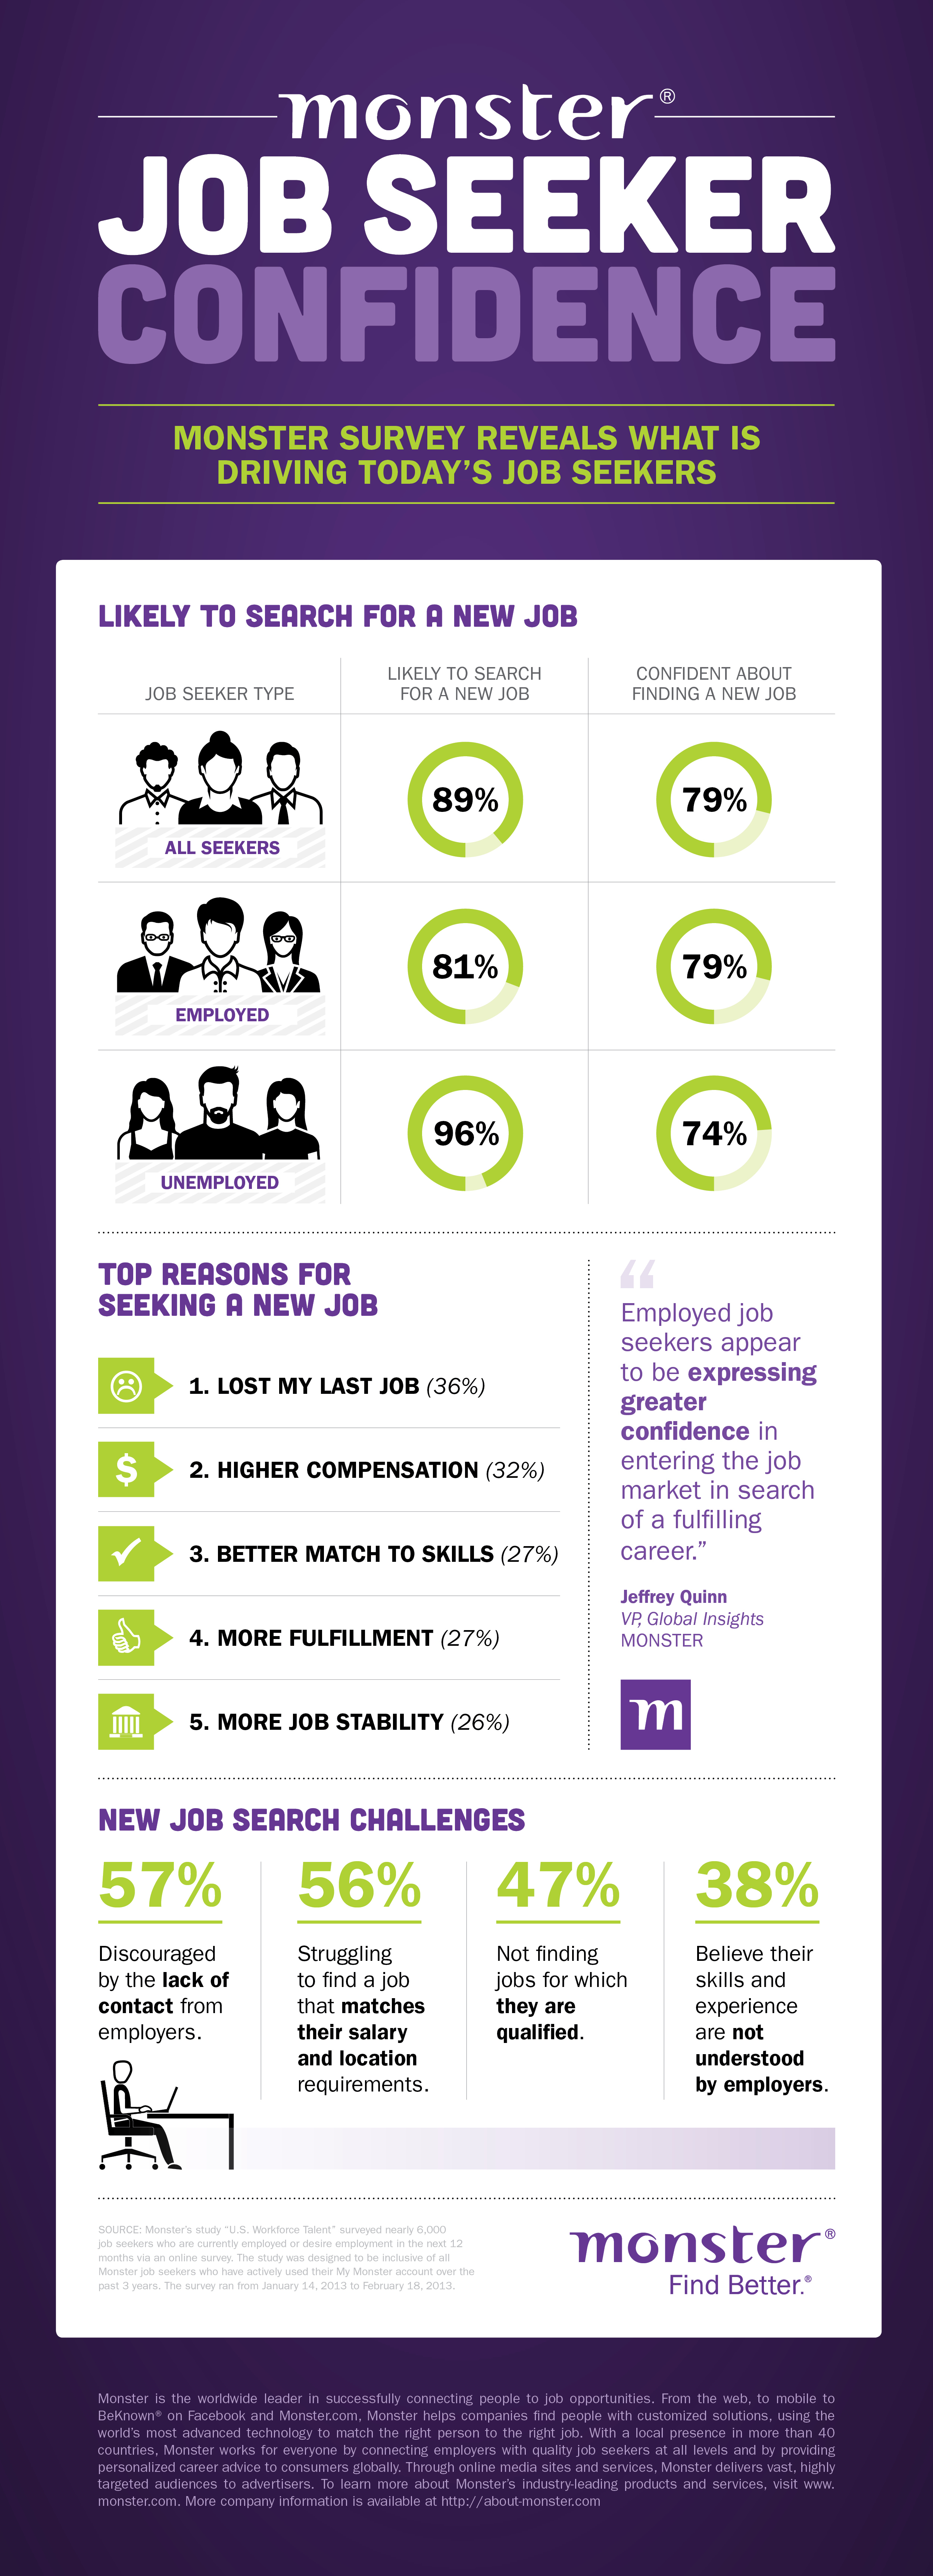 monster s workforce talent survey reveals optimistic job seeker monster s workforce talent survey reveals optimistic job seeker outlook business wire